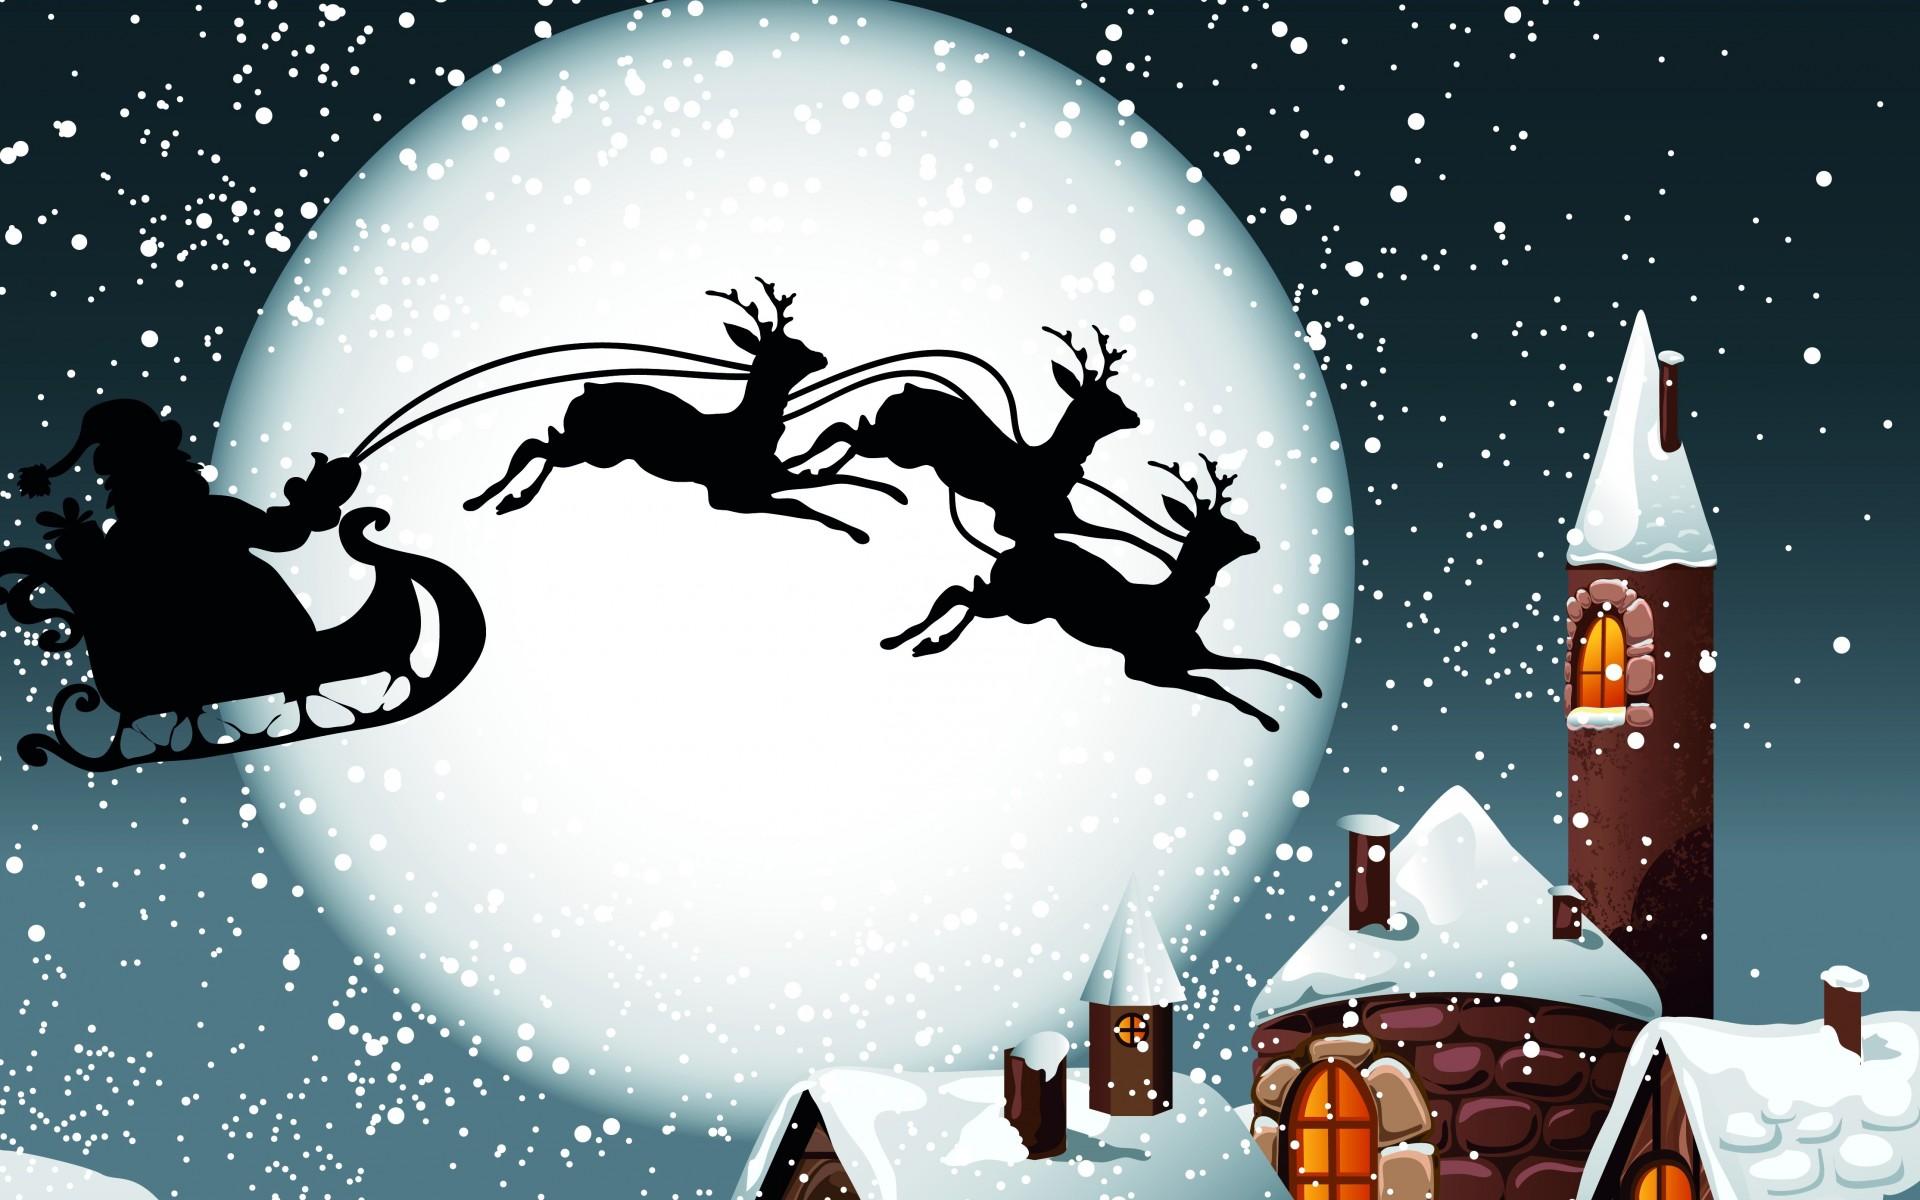 holidays christmas reindeer sleigh santa claus wallpaper